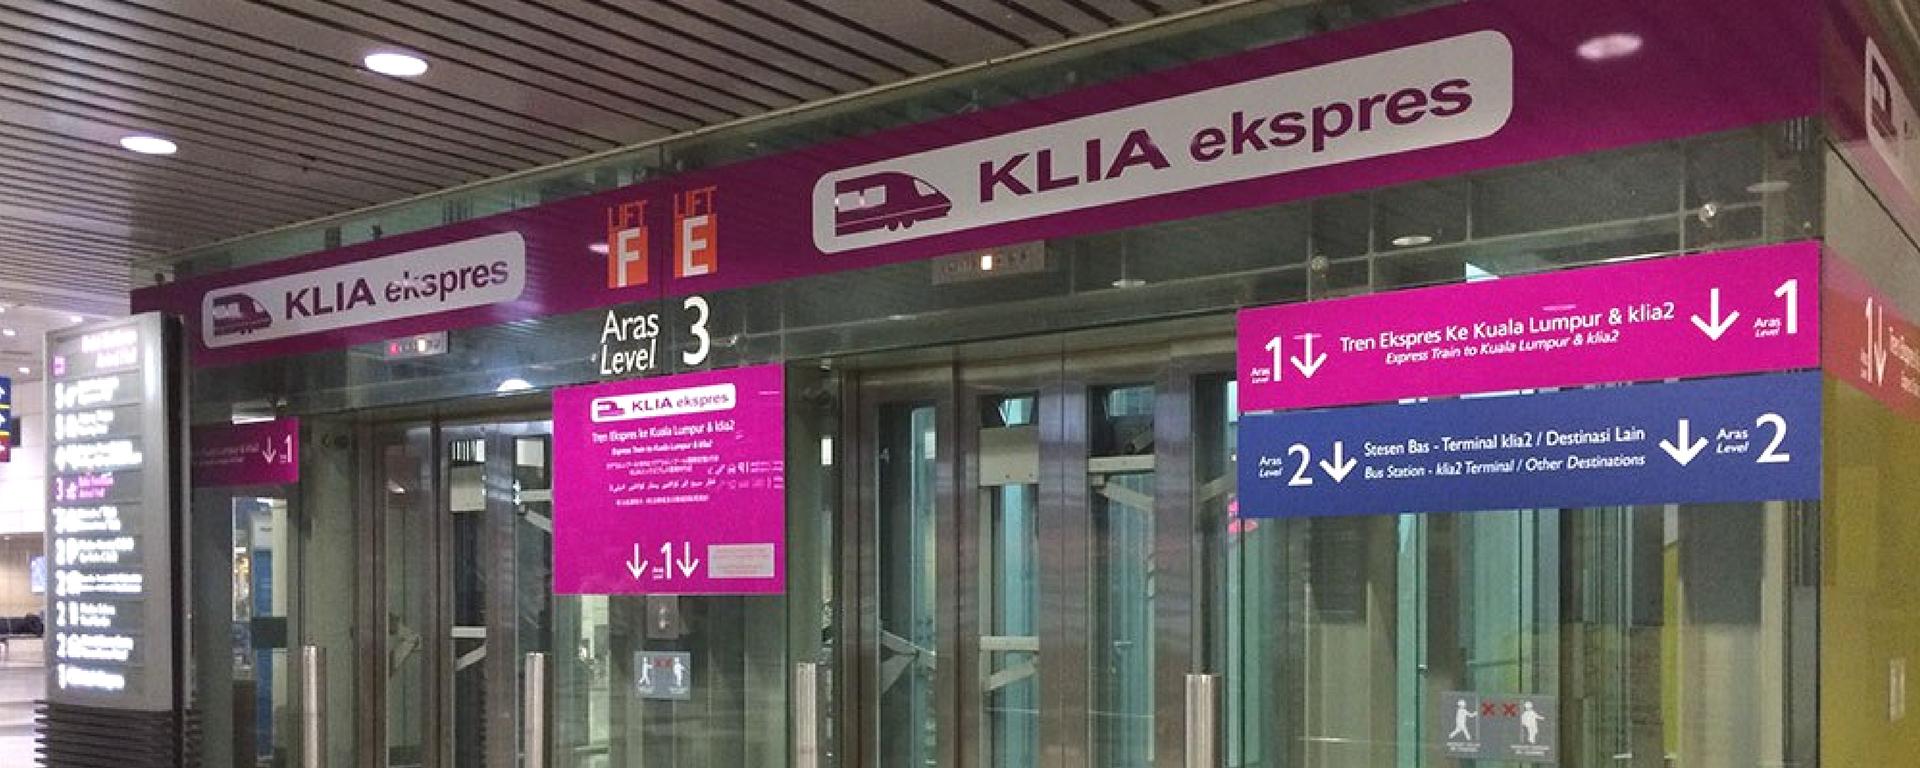 Klia Ekspres Fastest Ride Between Airport City Kl Sentral